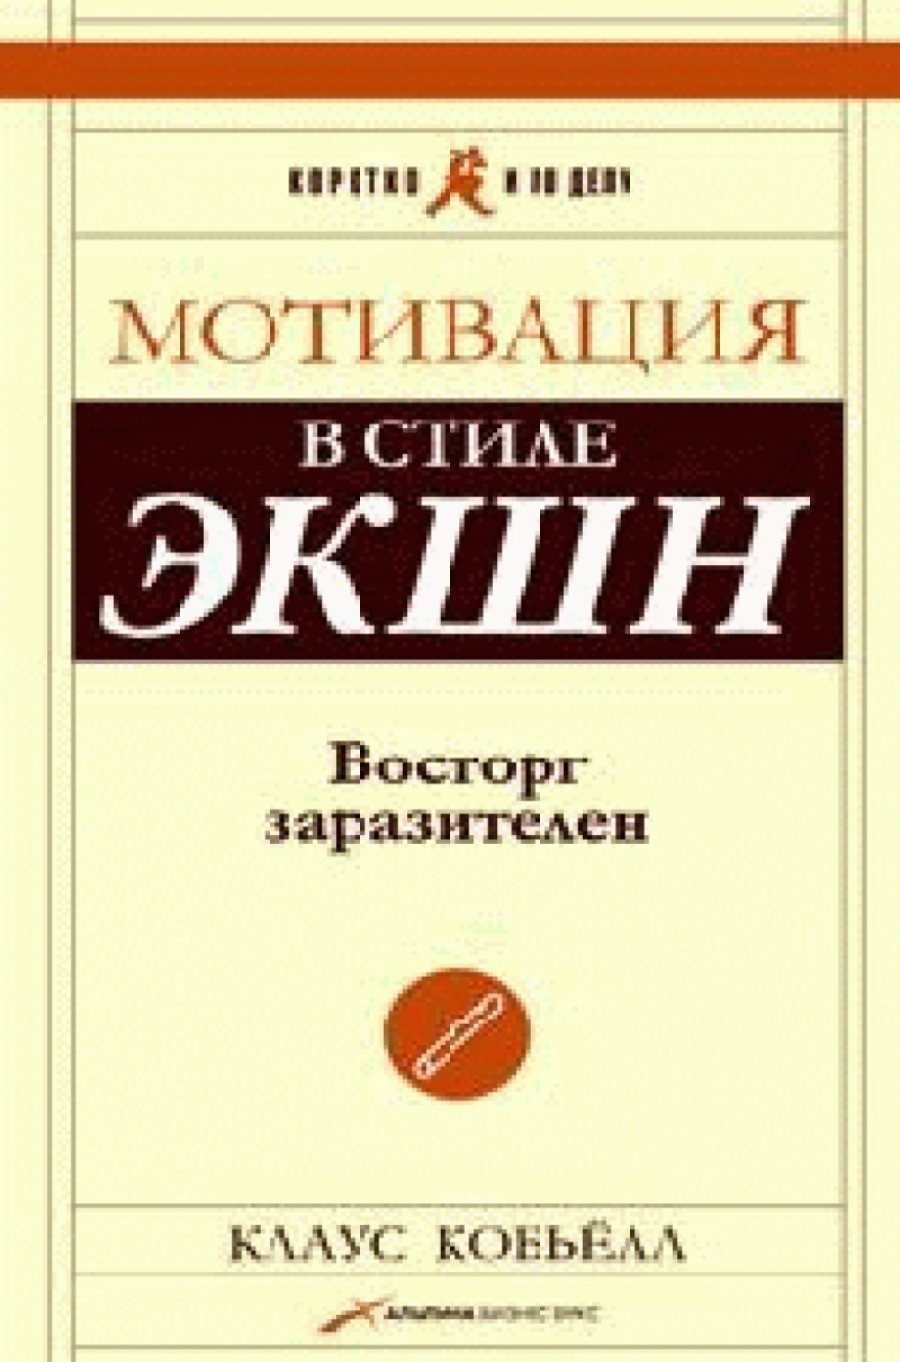 Обложка книги:  кобьёлл клаус - мотивация в стиле экшн. восторг заразителен